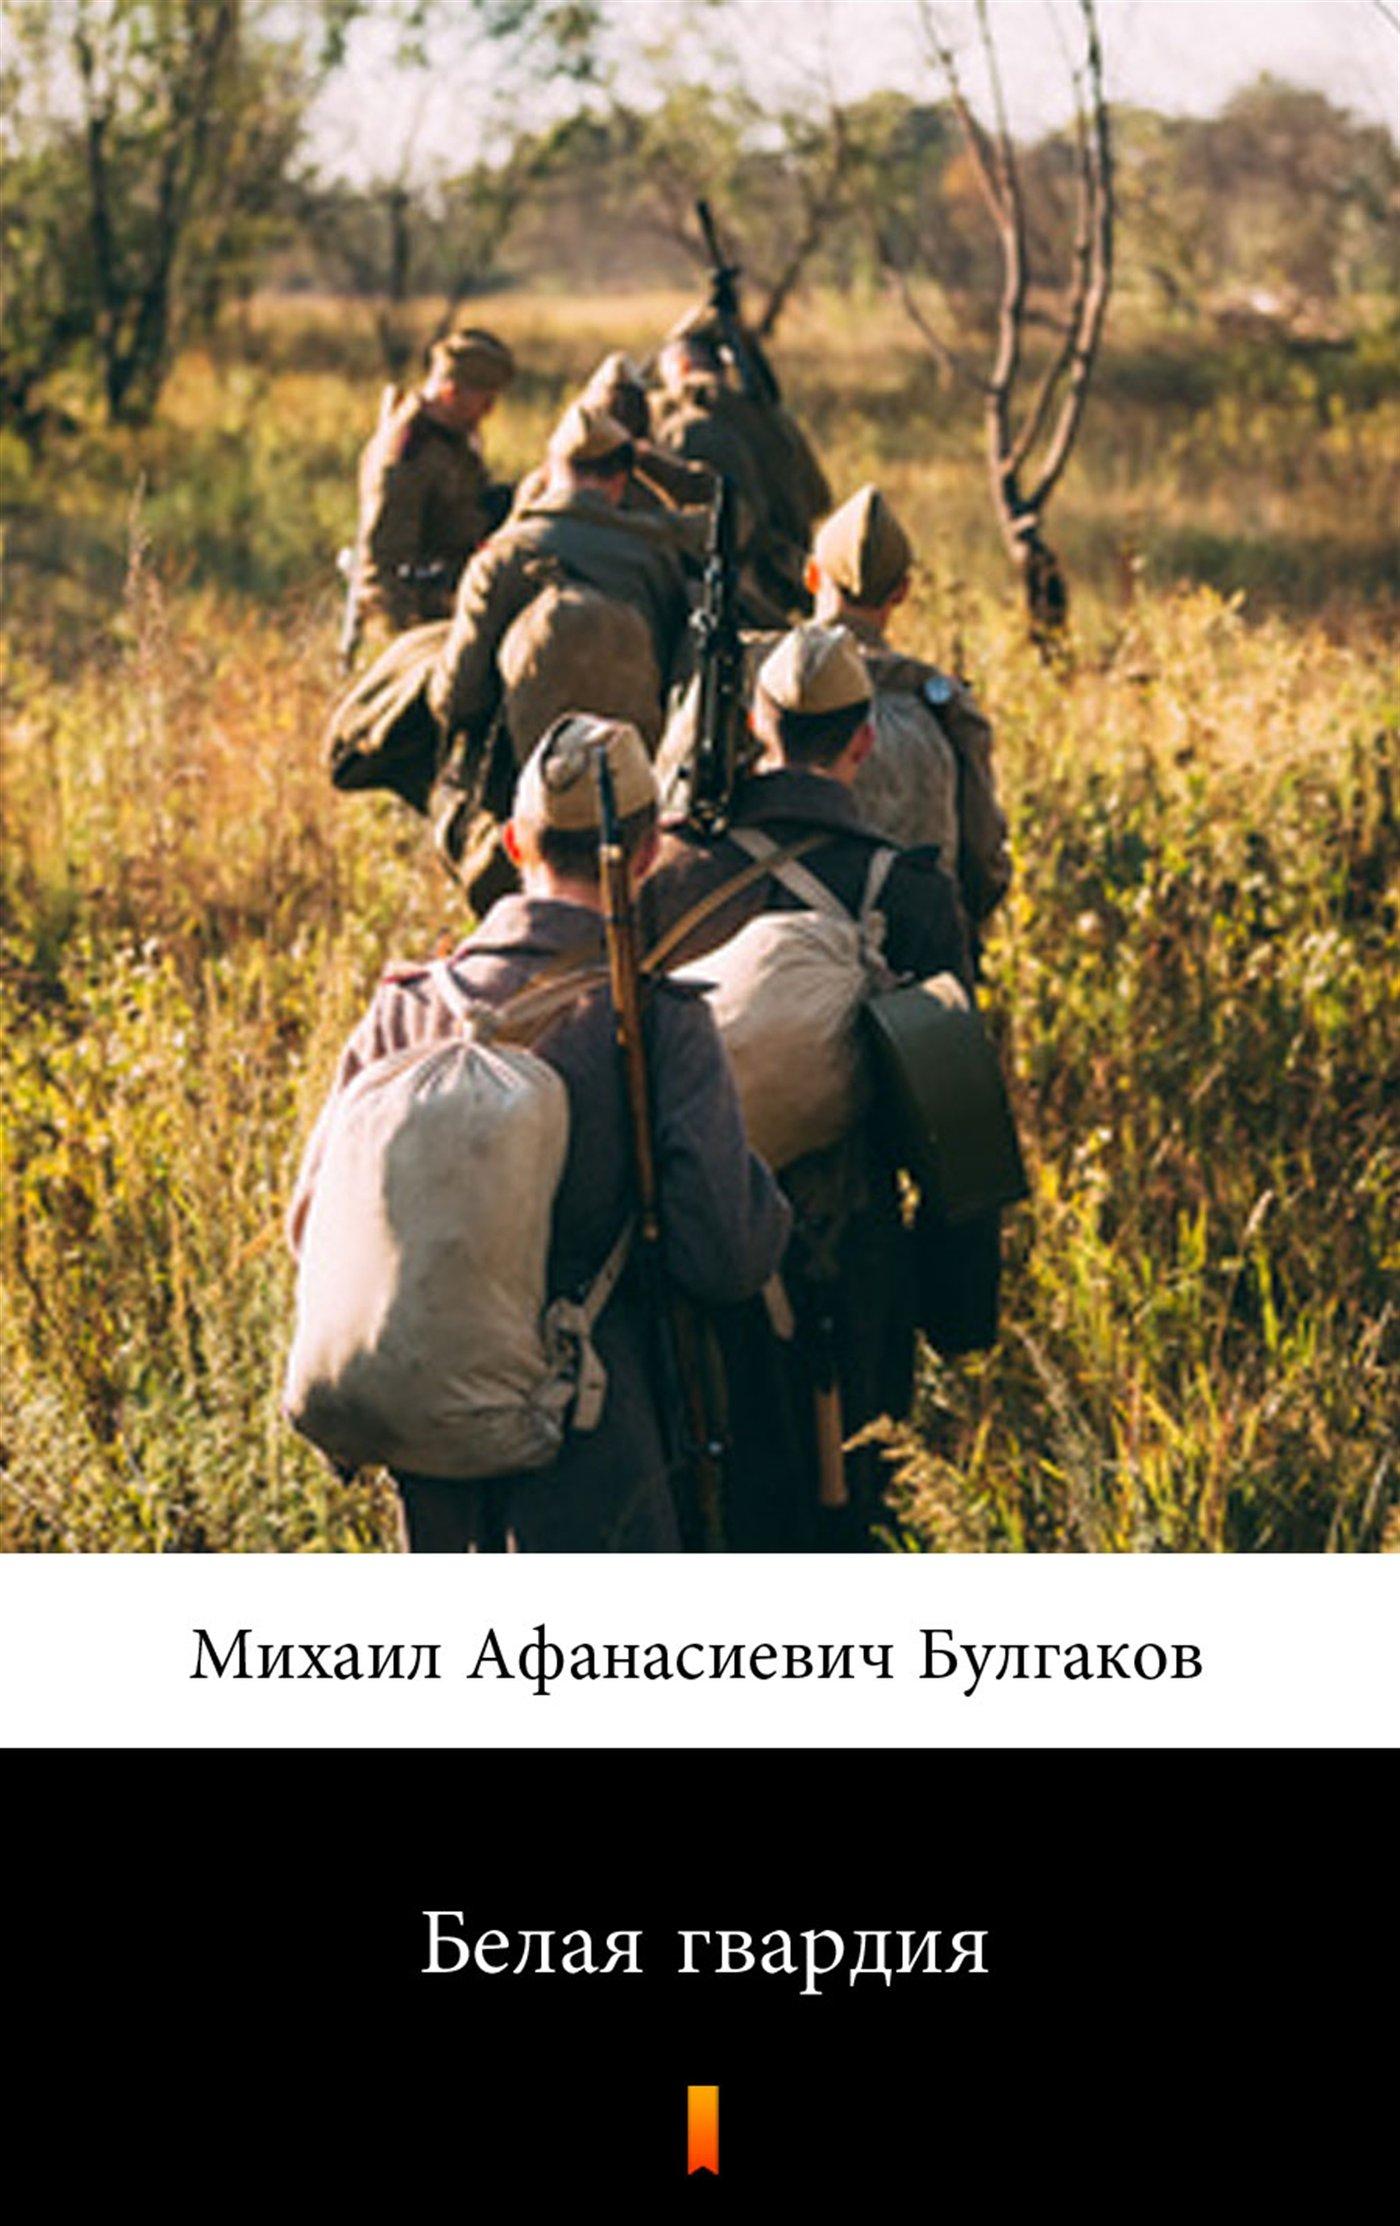 Белая гвардия - Ebook (Książka na Kindle) do pobrania w formacie MOBI